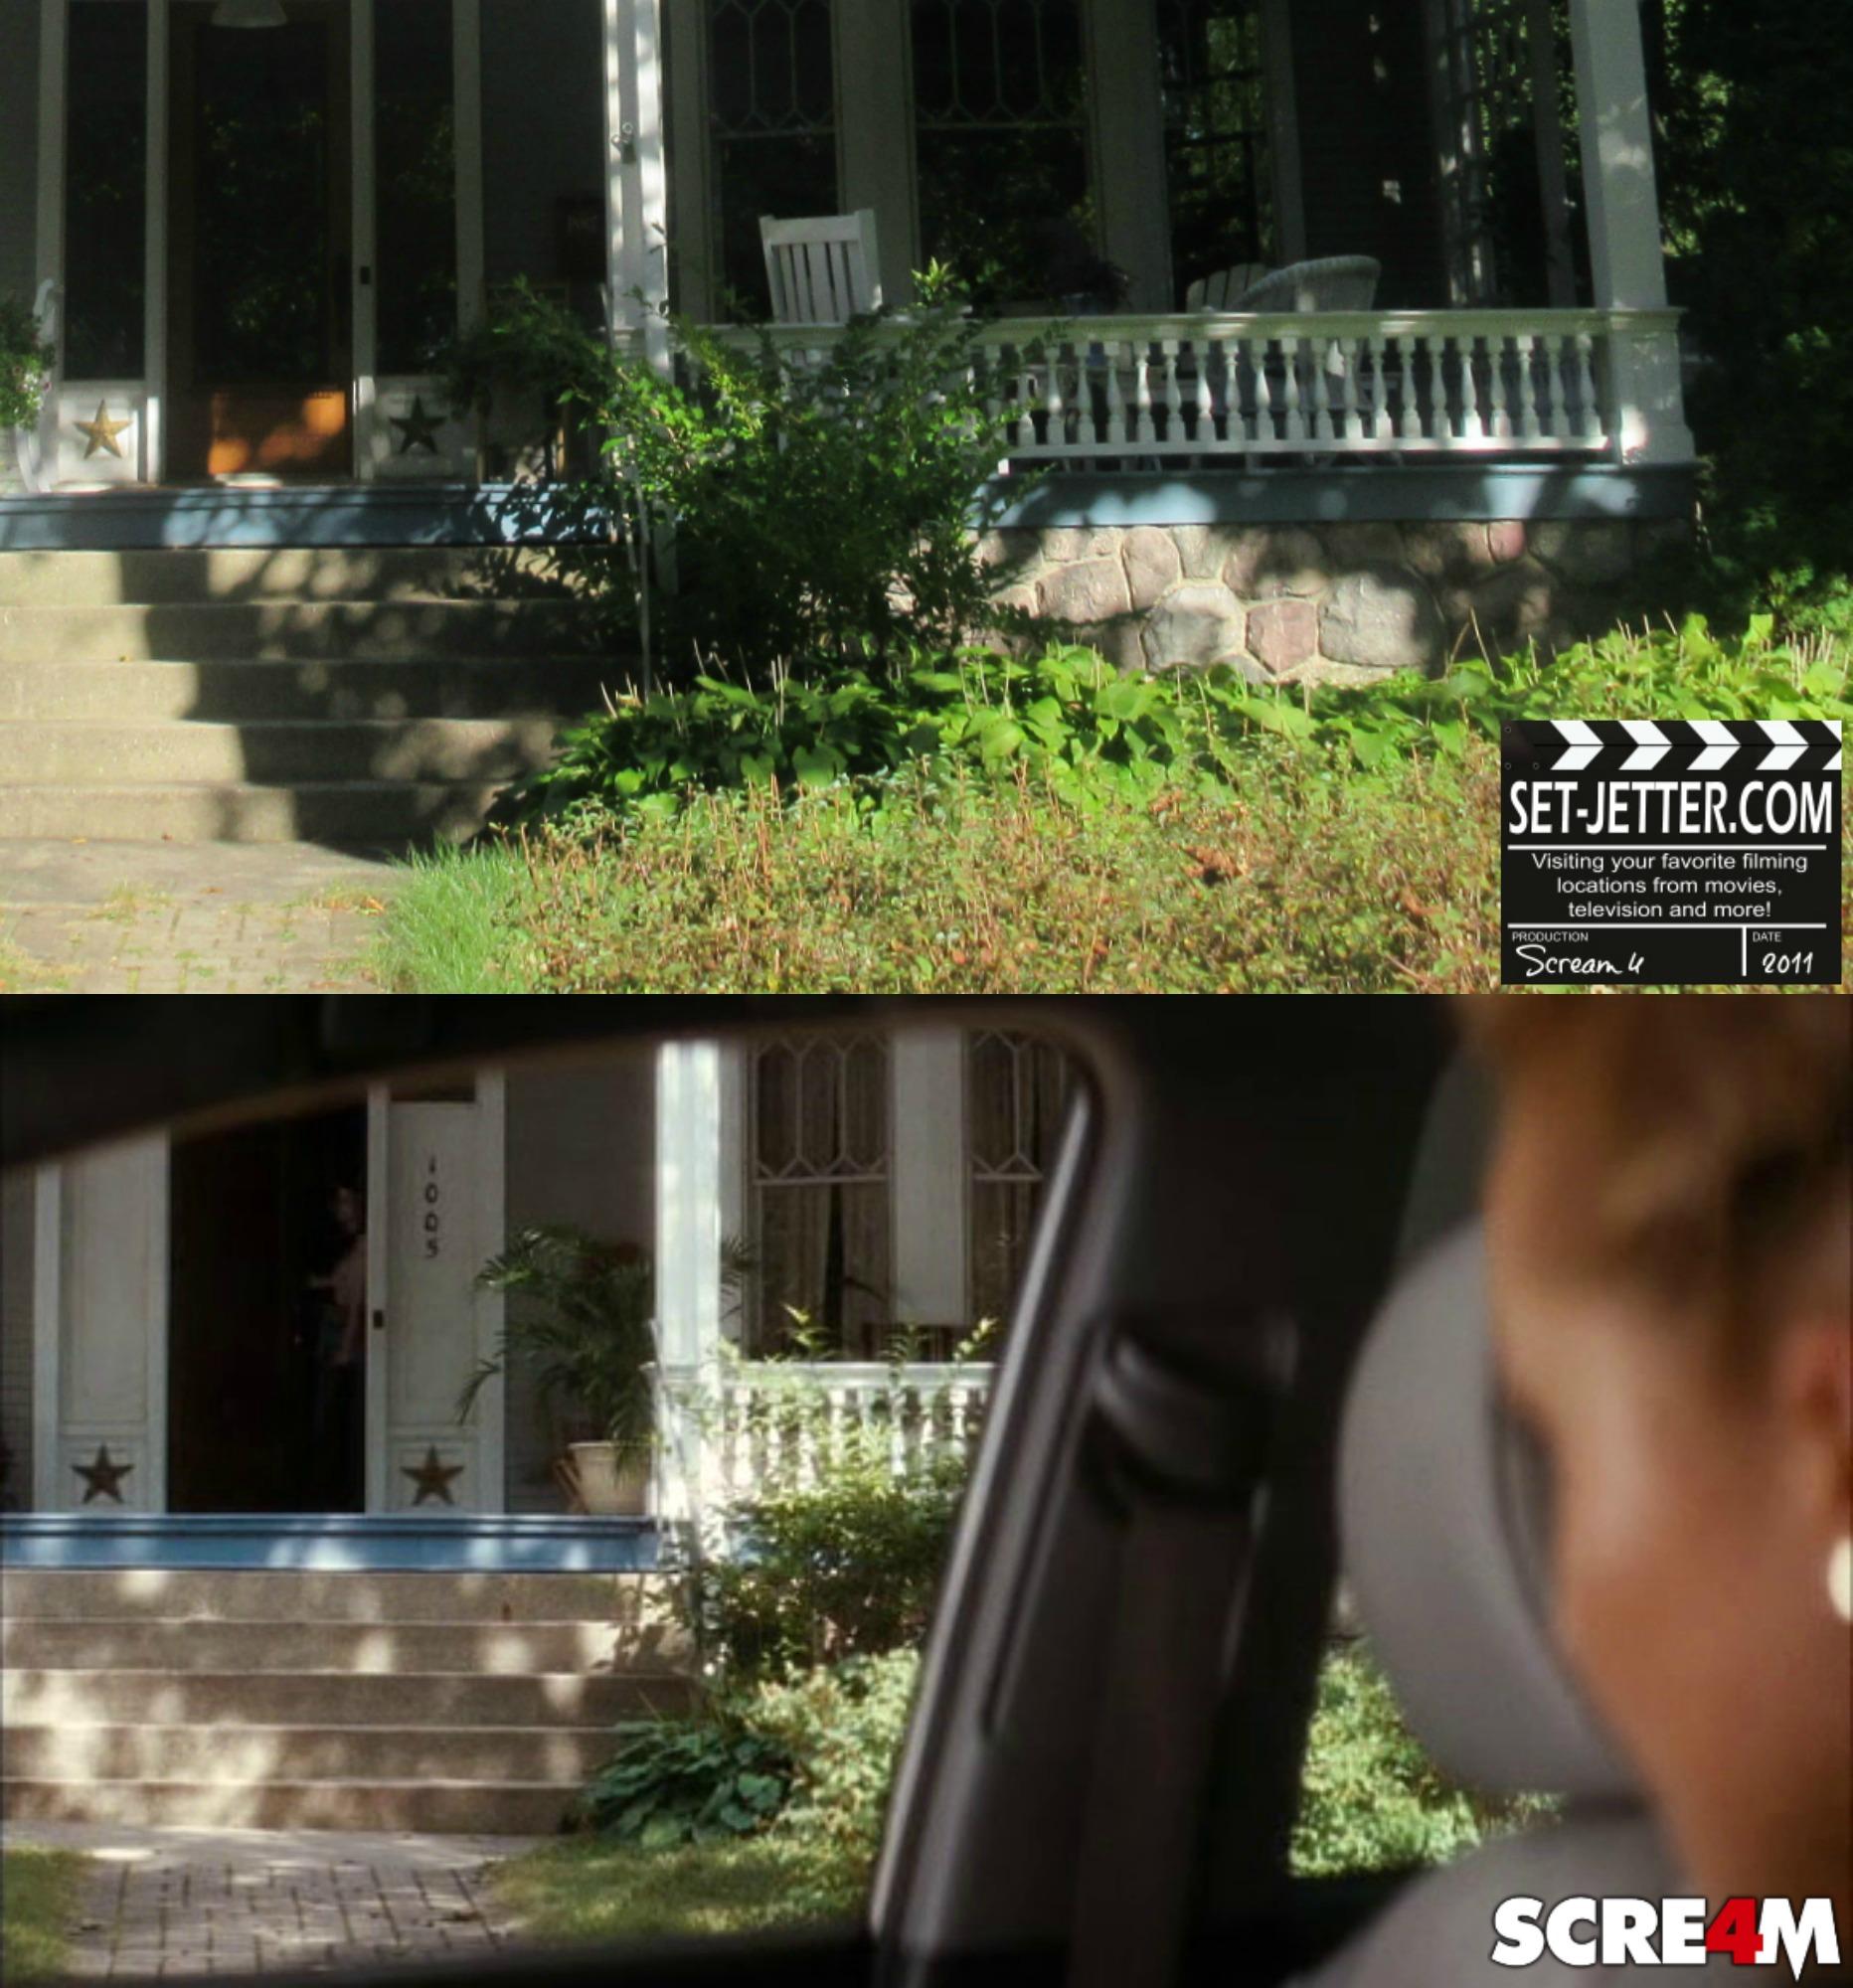 Scream4 comparison 32.jpg